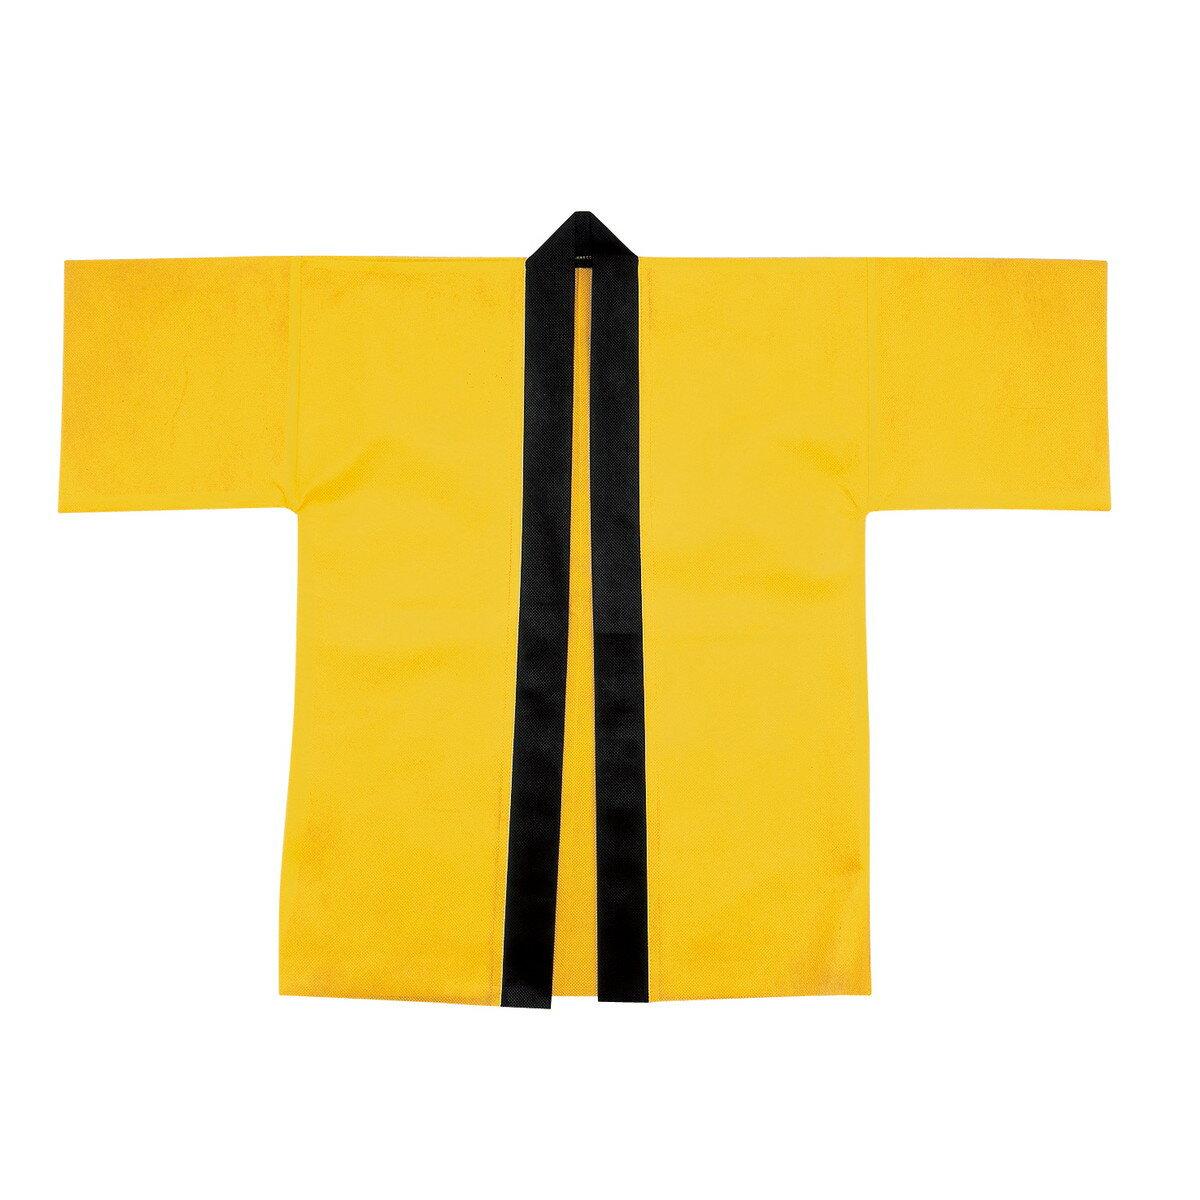 Artec(アーテック) カラー不織布ハッピ 子供用 J 黄 #1290